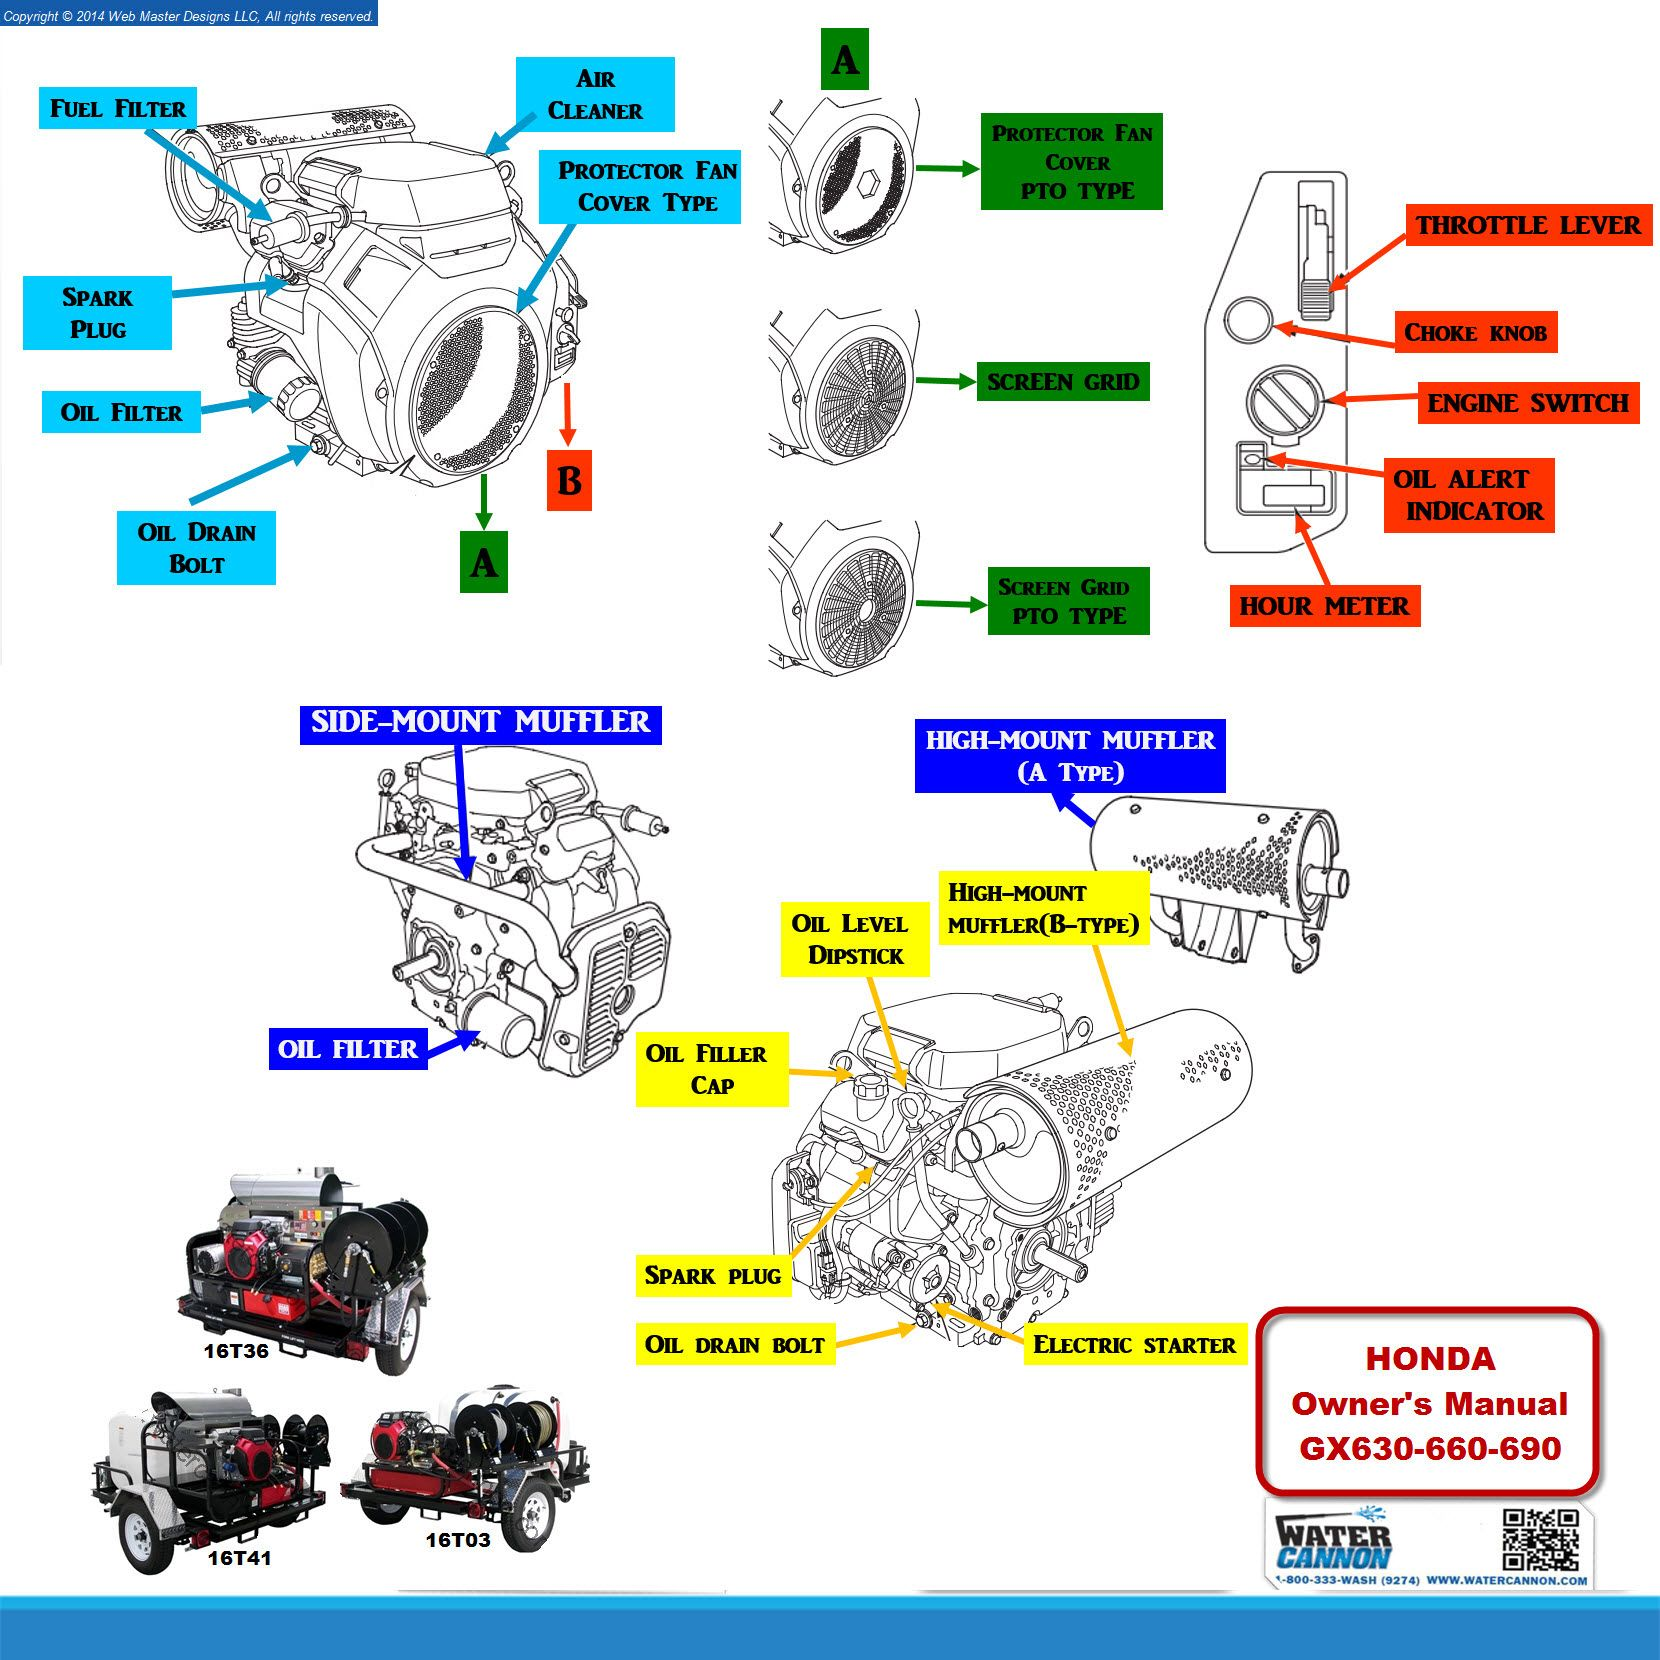 Honda Gx630 660 690 Repair Manual Gx690 Wiring Diagram Owner S Info Graphics Pinterest Rh Com Parts Ezgo